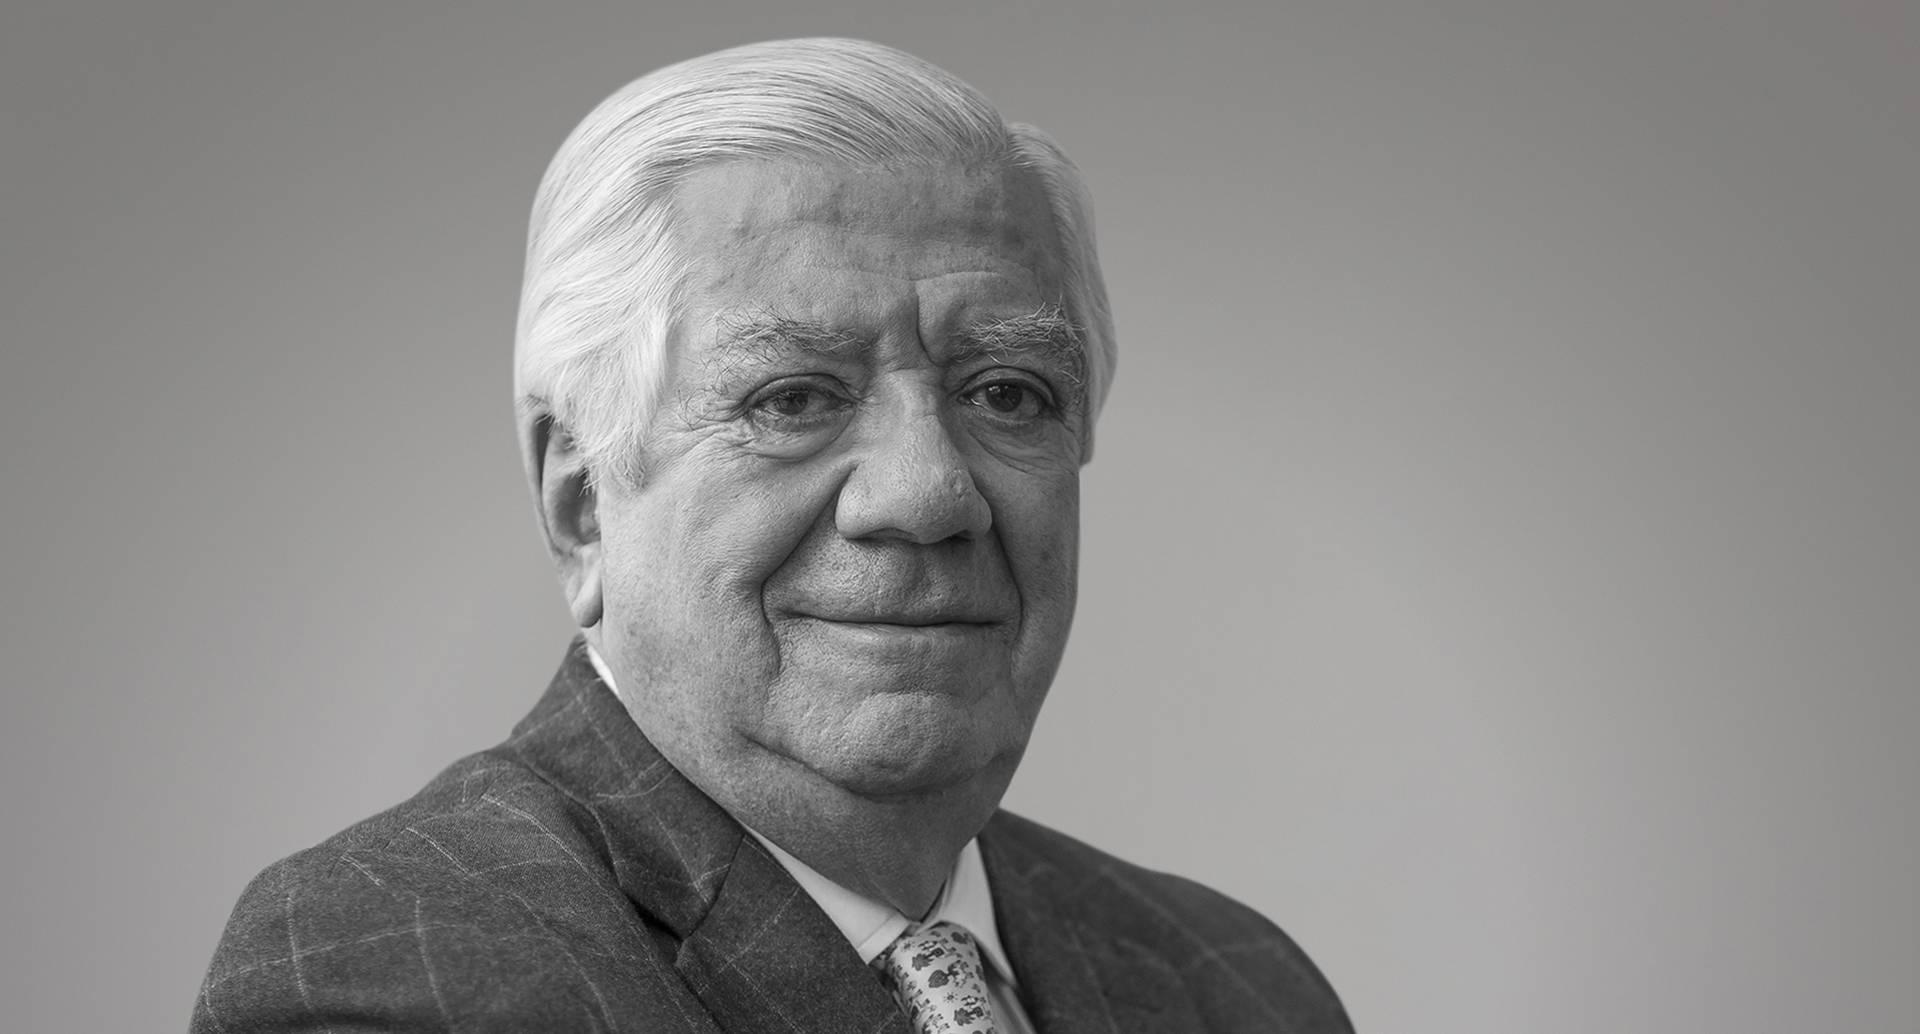 Marco Tulio Gutiérrez